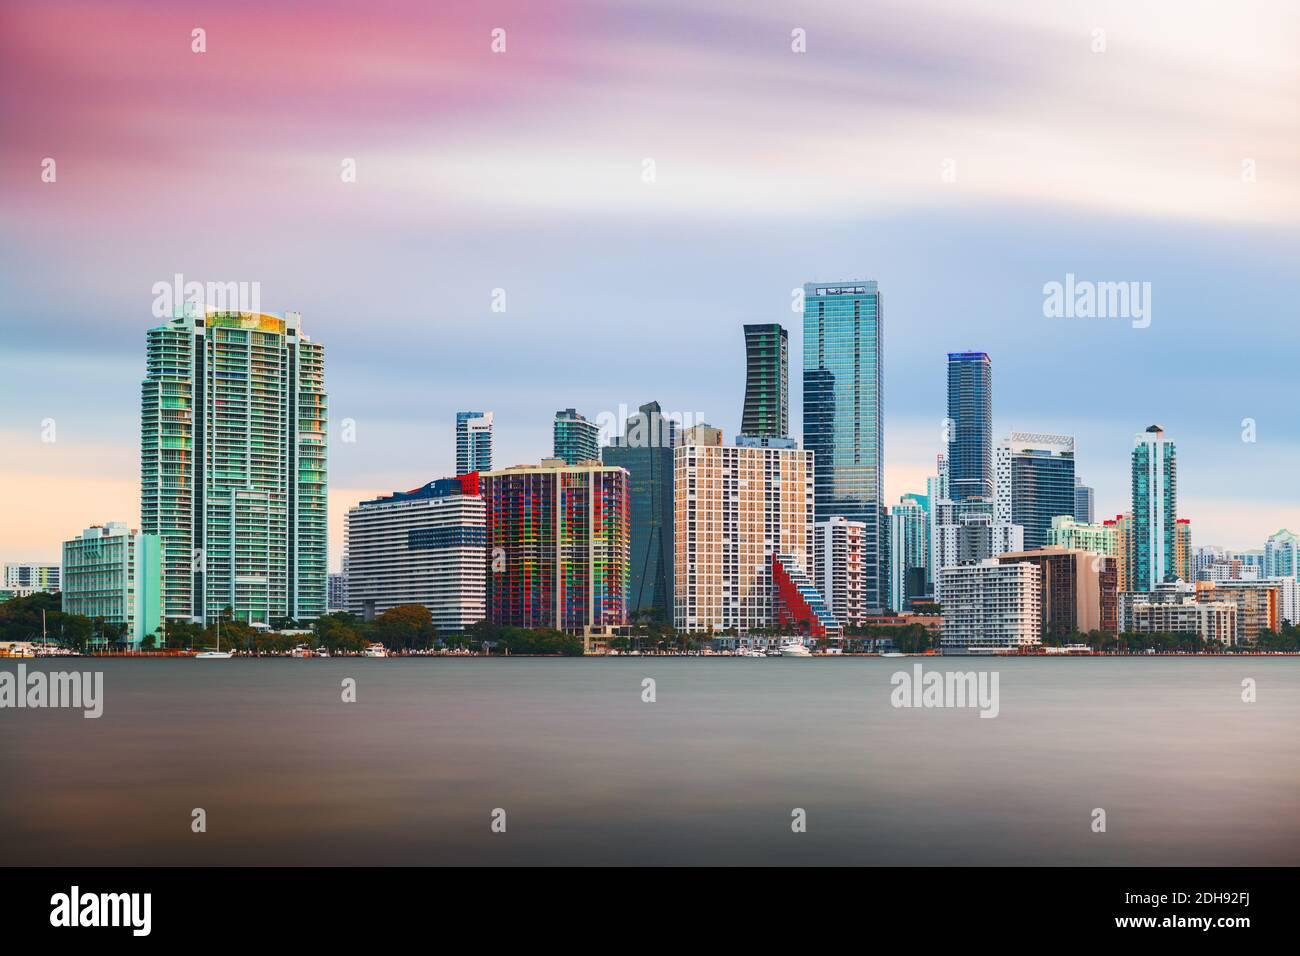 Miami, Florida, USA downtown city skyline on Biscayne Bay at twilight. Stock Photo